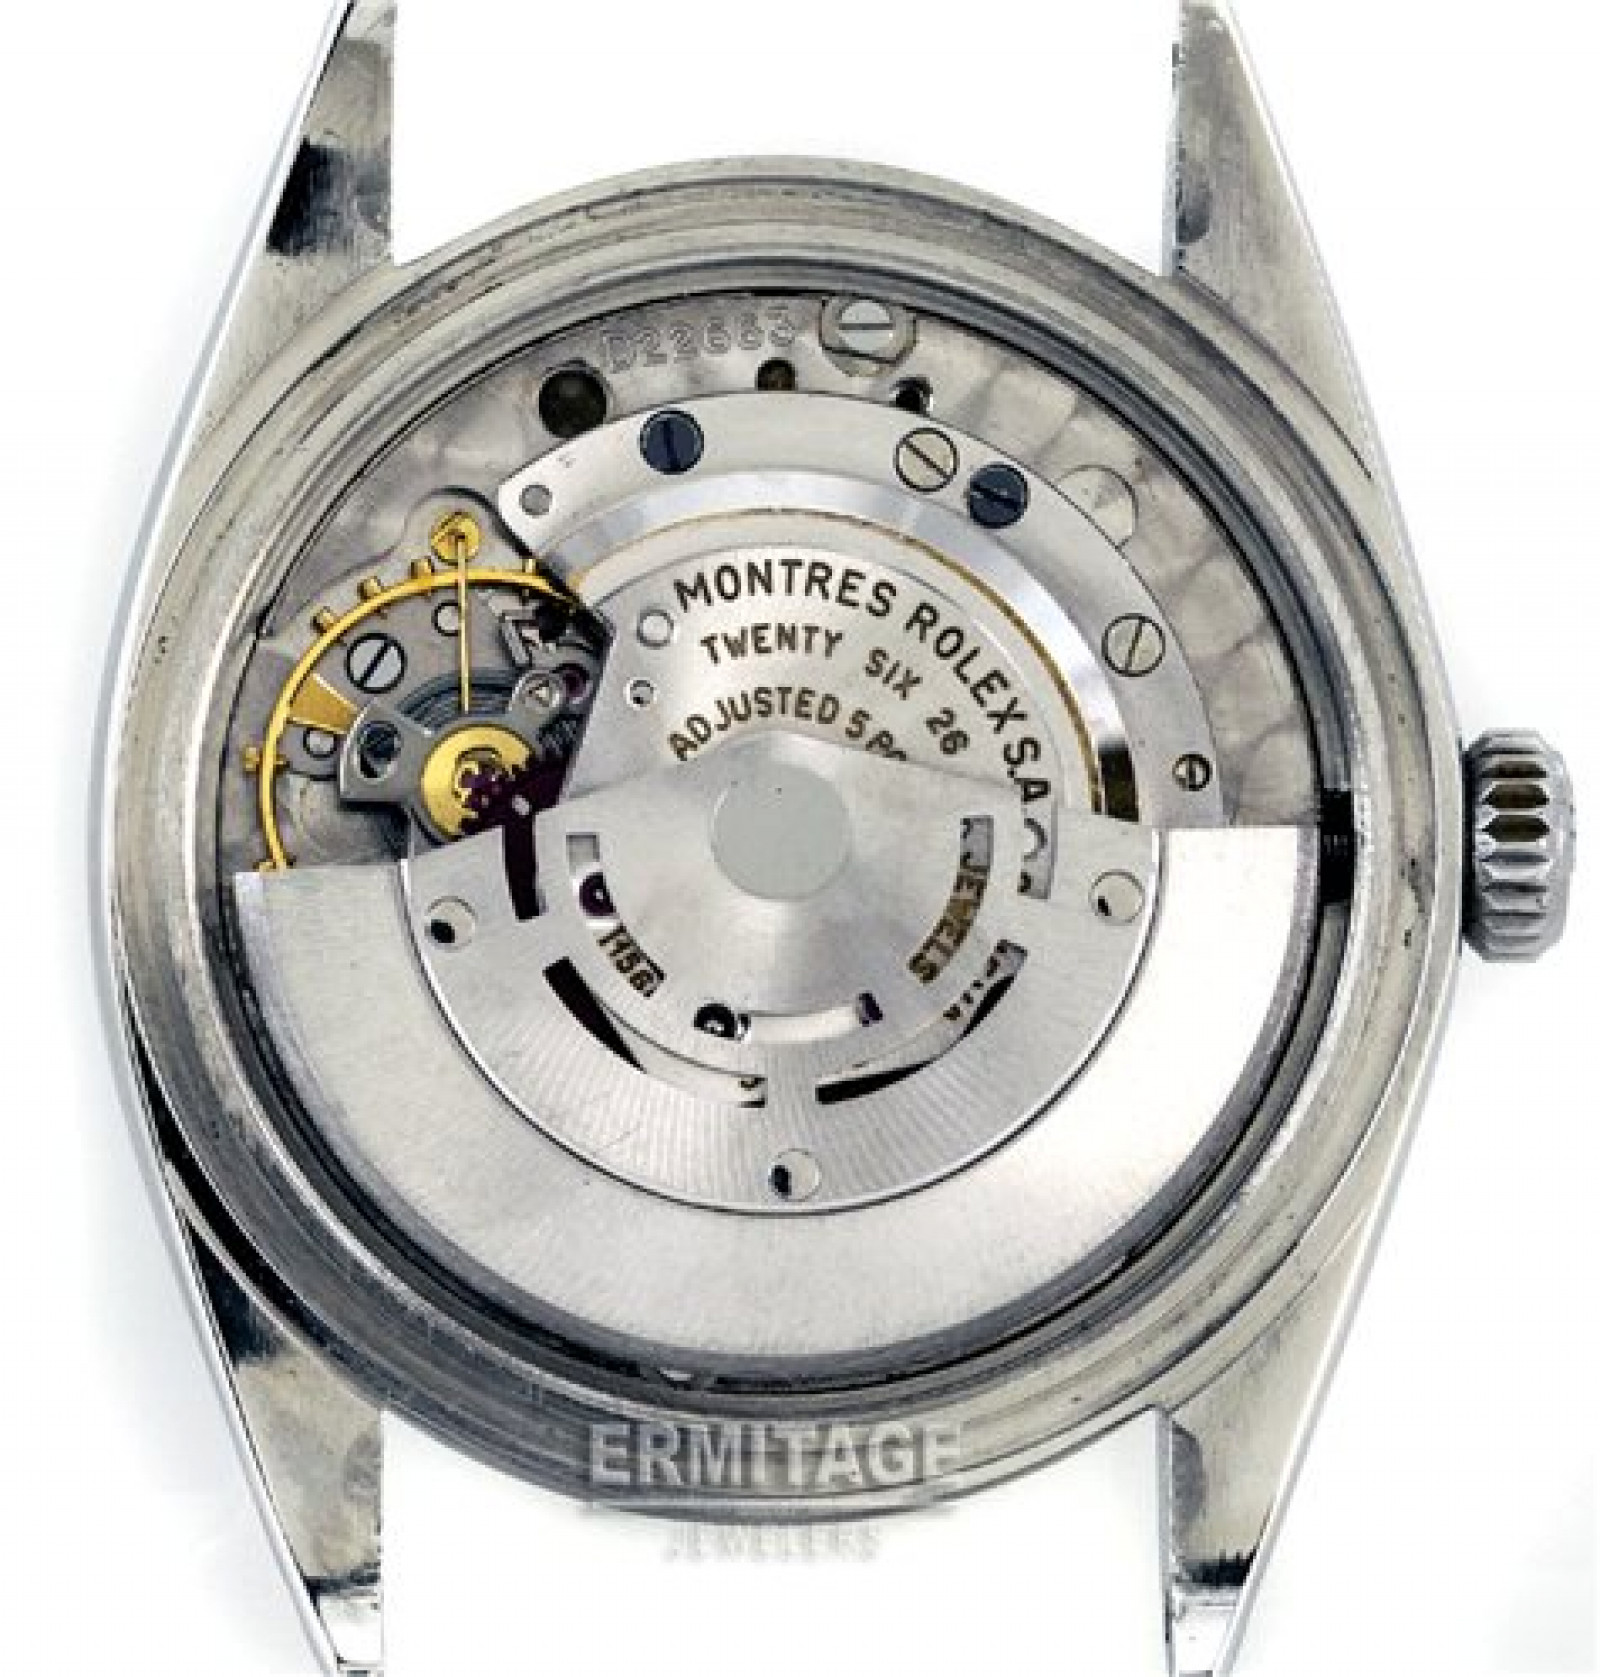 Vintage Rolex Explorer 1016 Steel with Black Dial